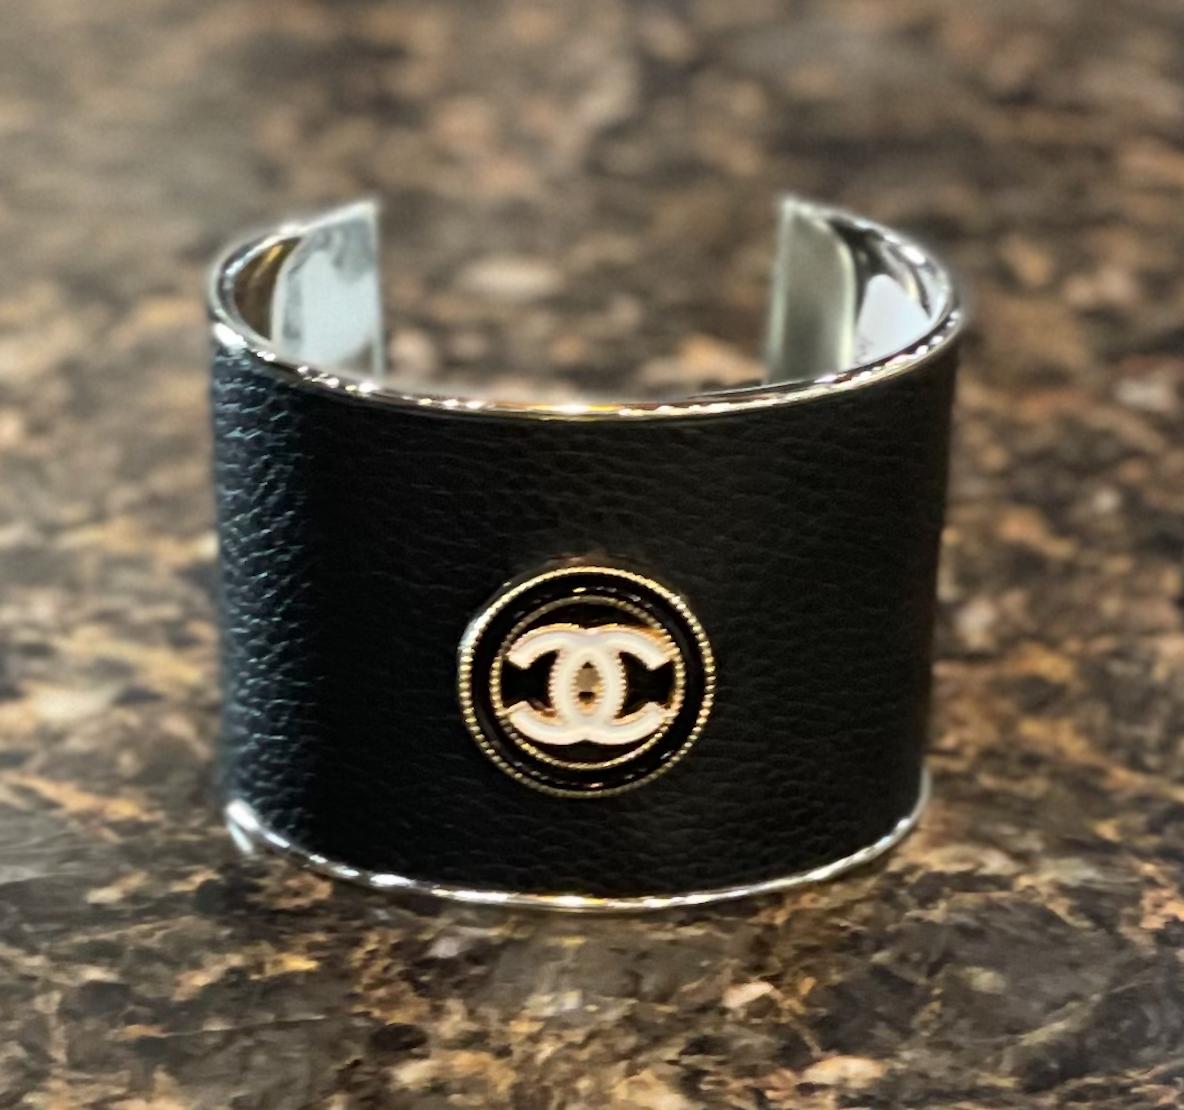 Blk Leather Chanel Statement Cuff